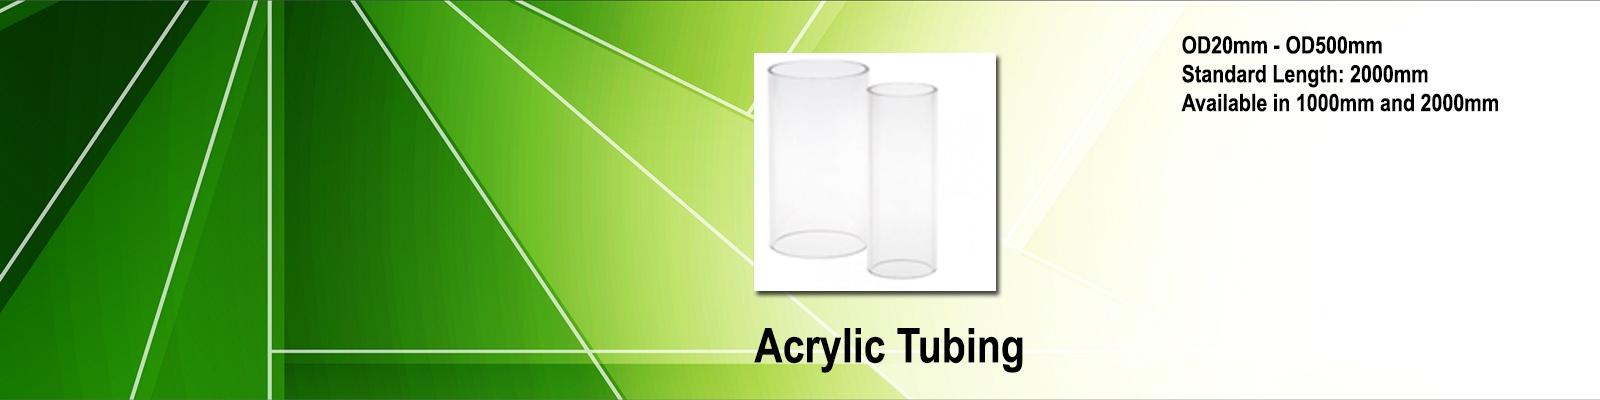 Acrylic Tubing by iPlastics